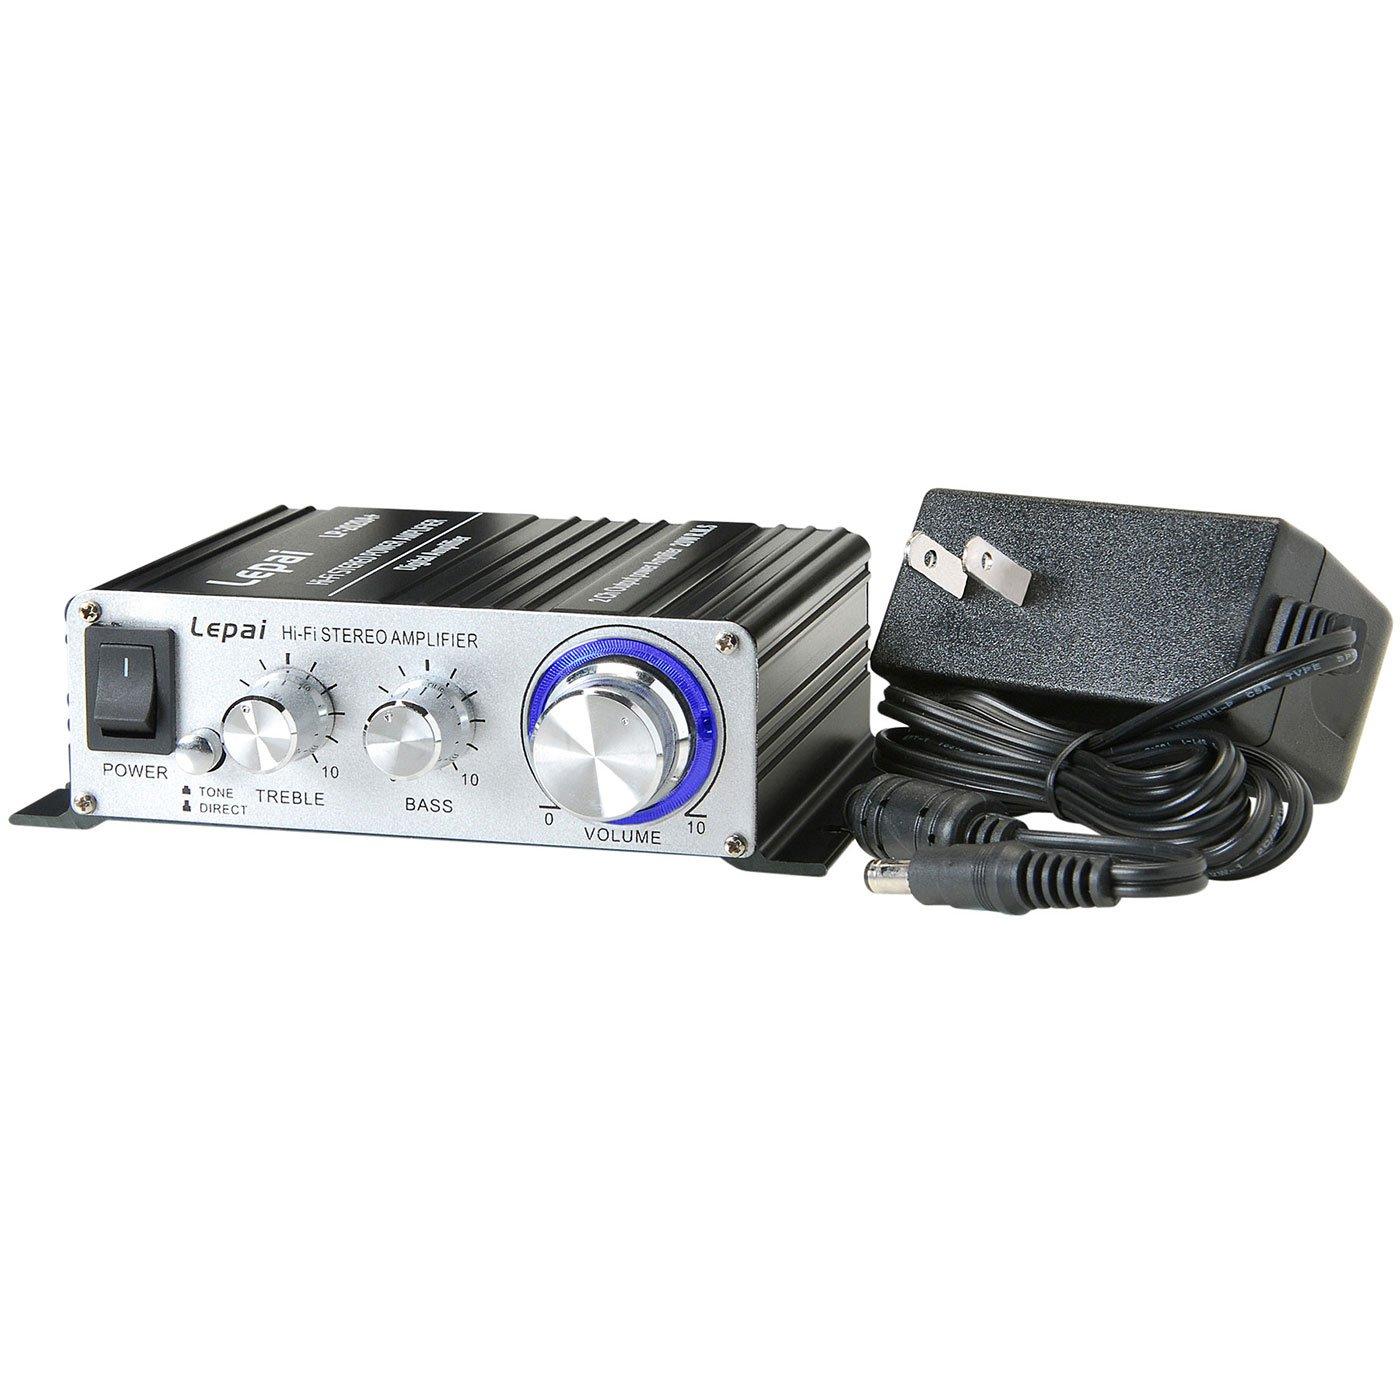 Seojack Lp 2020a Tripath Ta2020 Class T Hi Fi Audio D Amplifier Circuit Tpa3116d2 Tpa3118d2 Subwoofer With Power Supply Home Theater